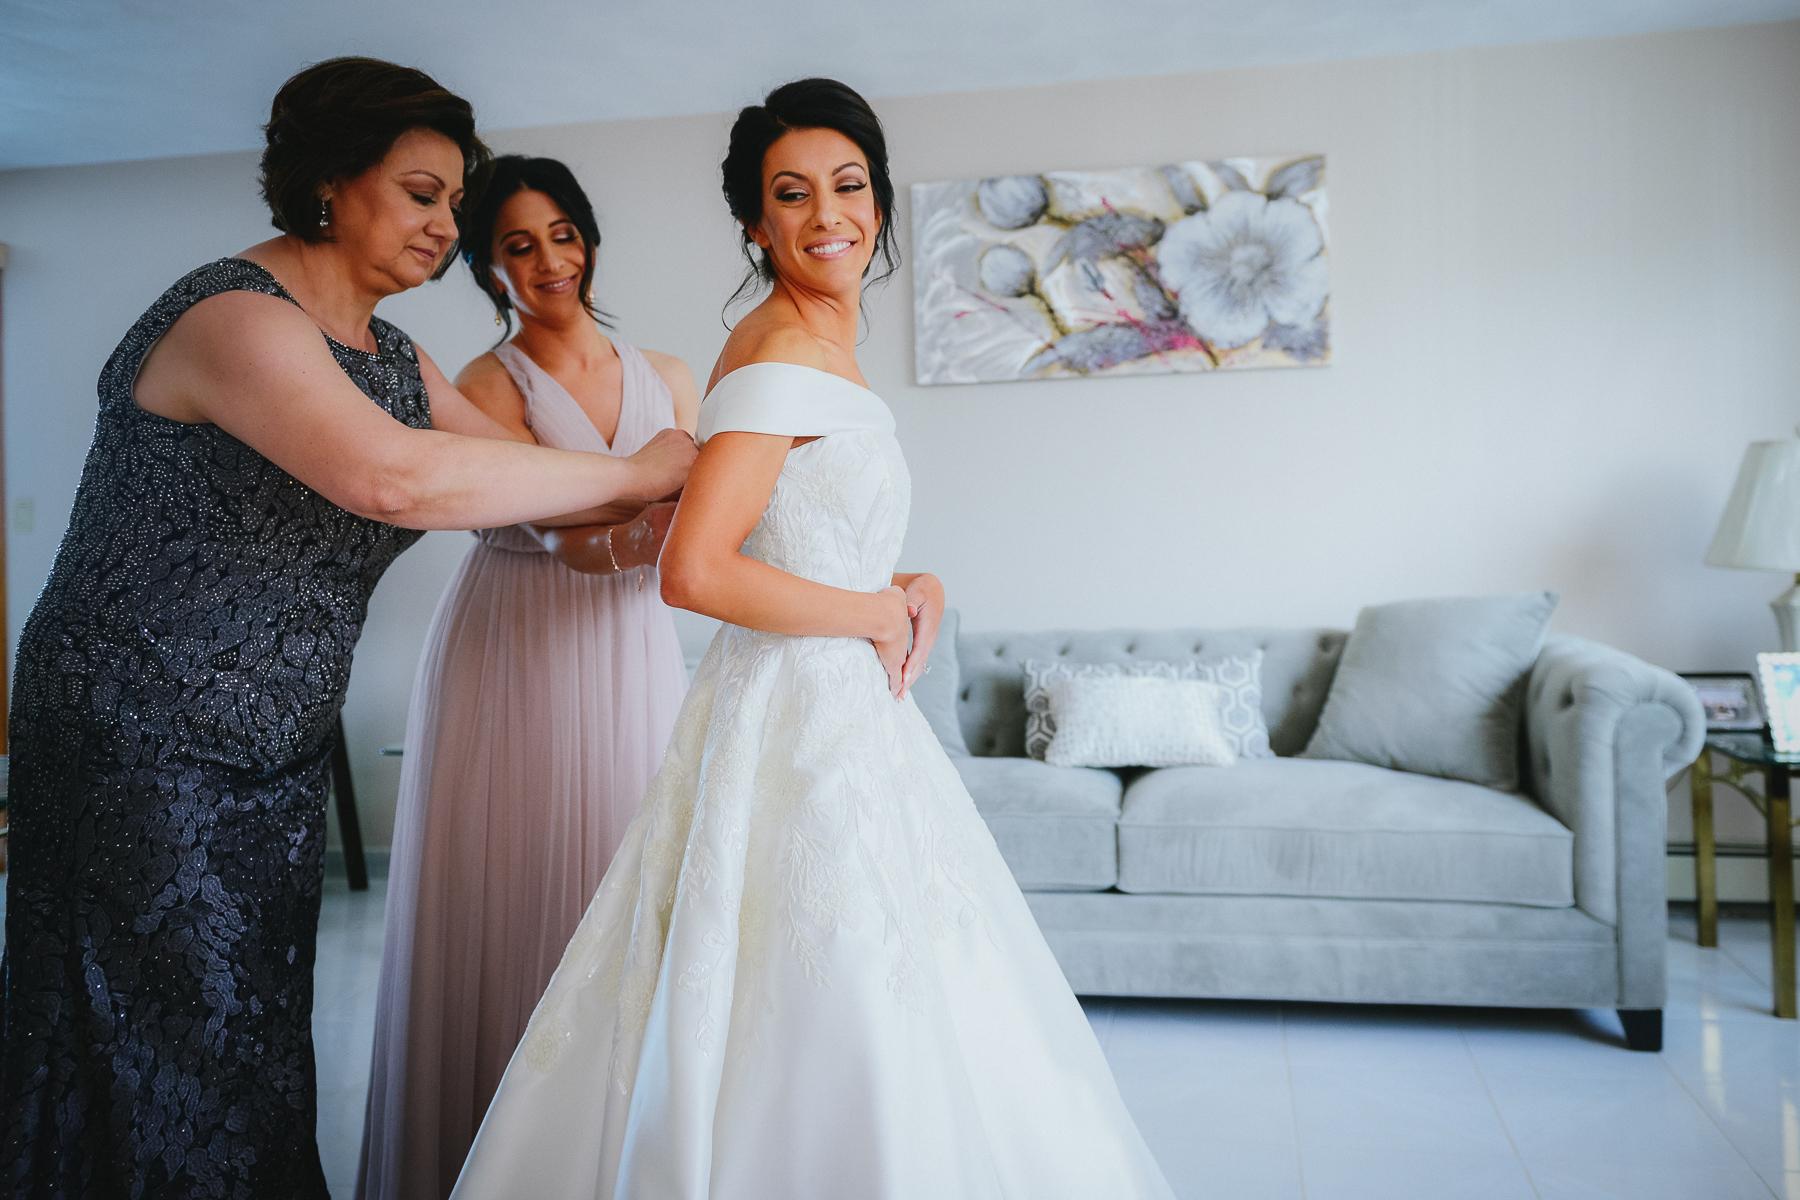 Boston Wedding Photographer Christian Pleva-28.jpg